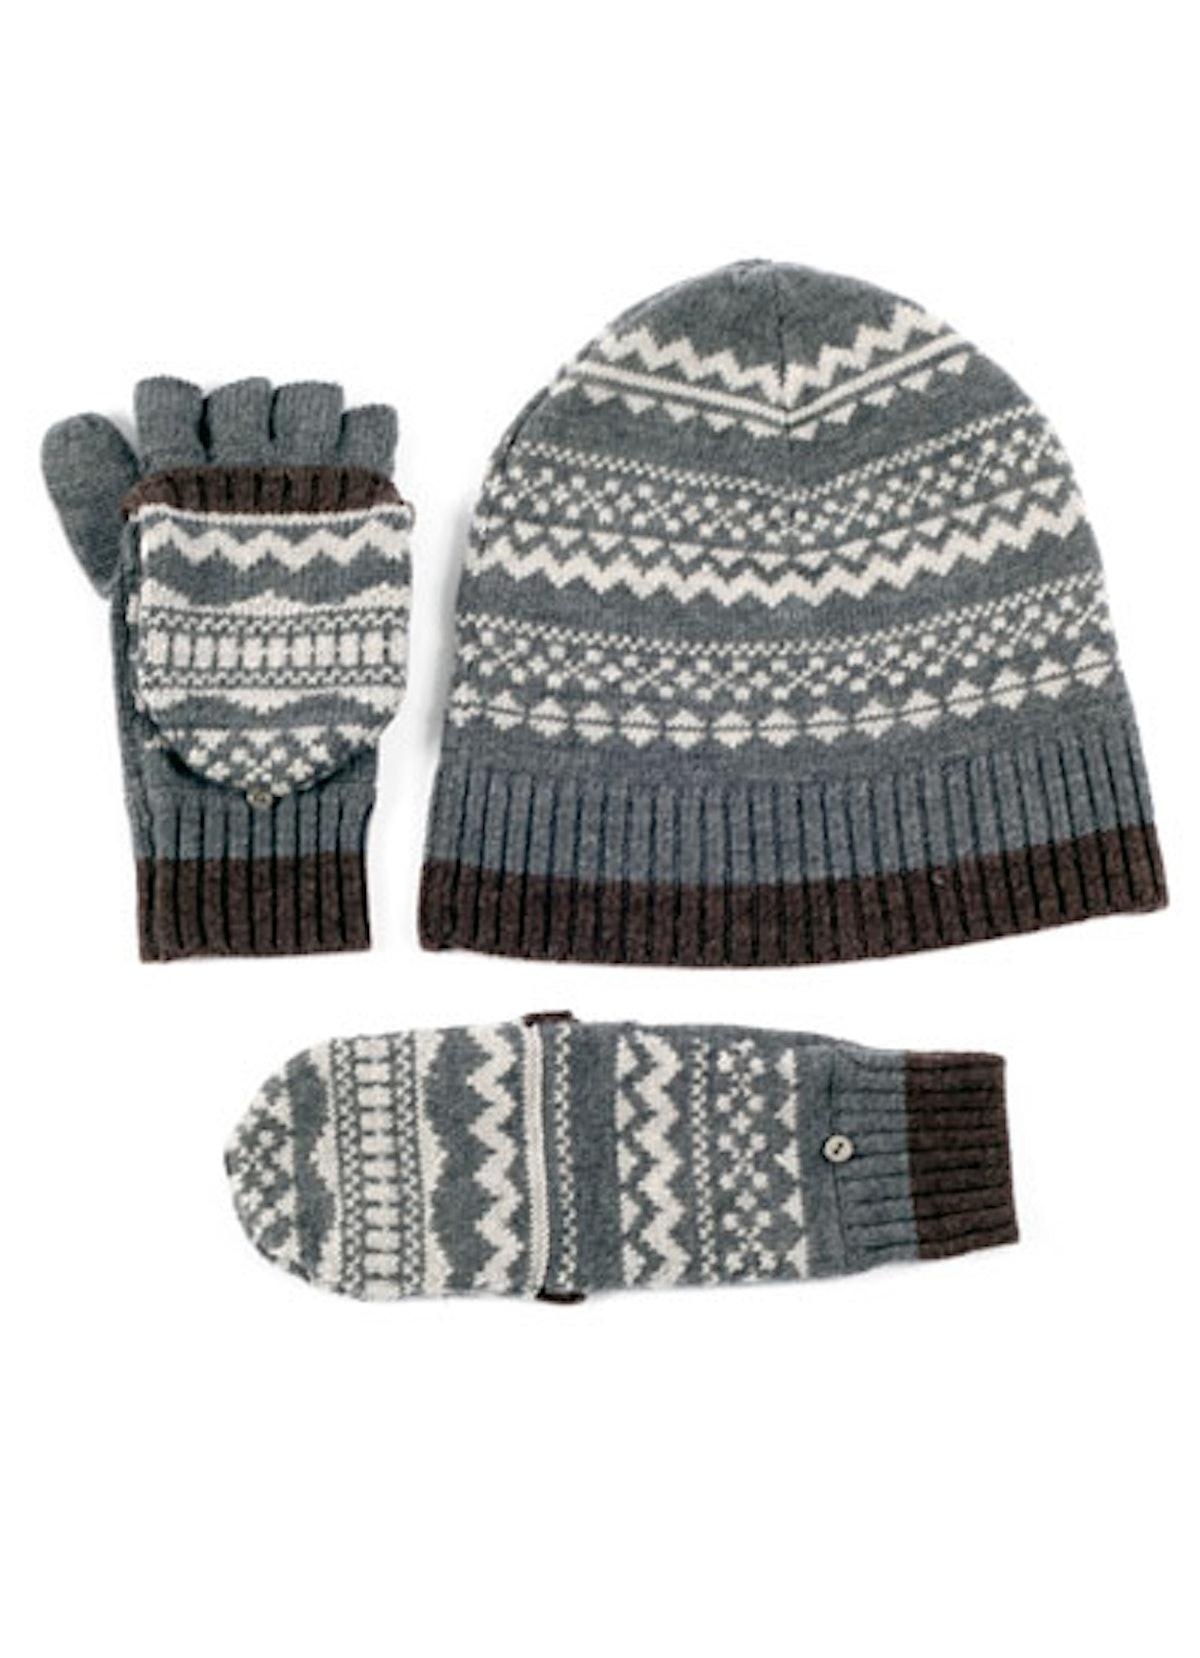 acss-winter-accessories-04-v.jpg